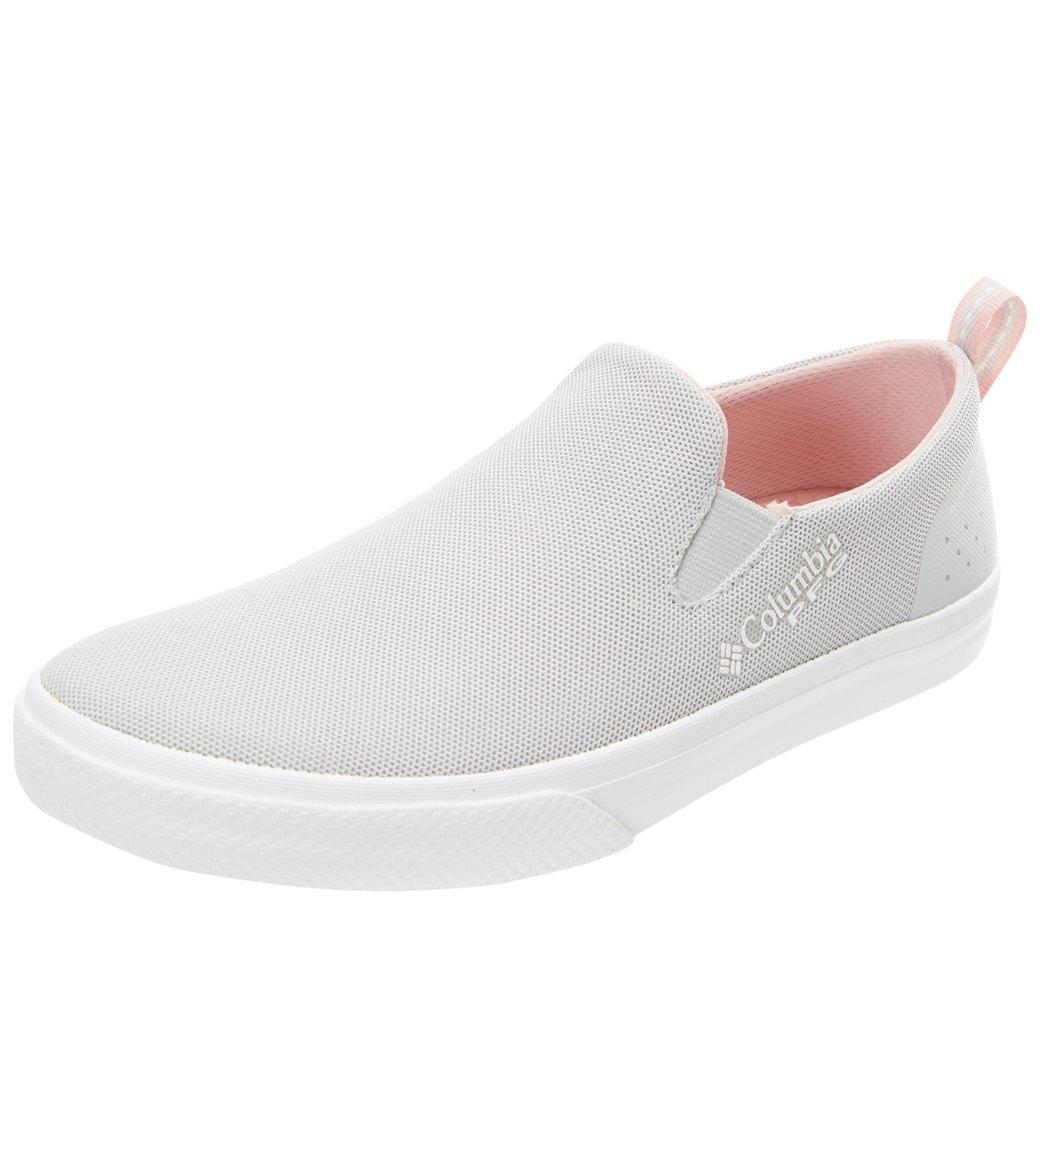 Dorado Slip PFG Boat Shoe